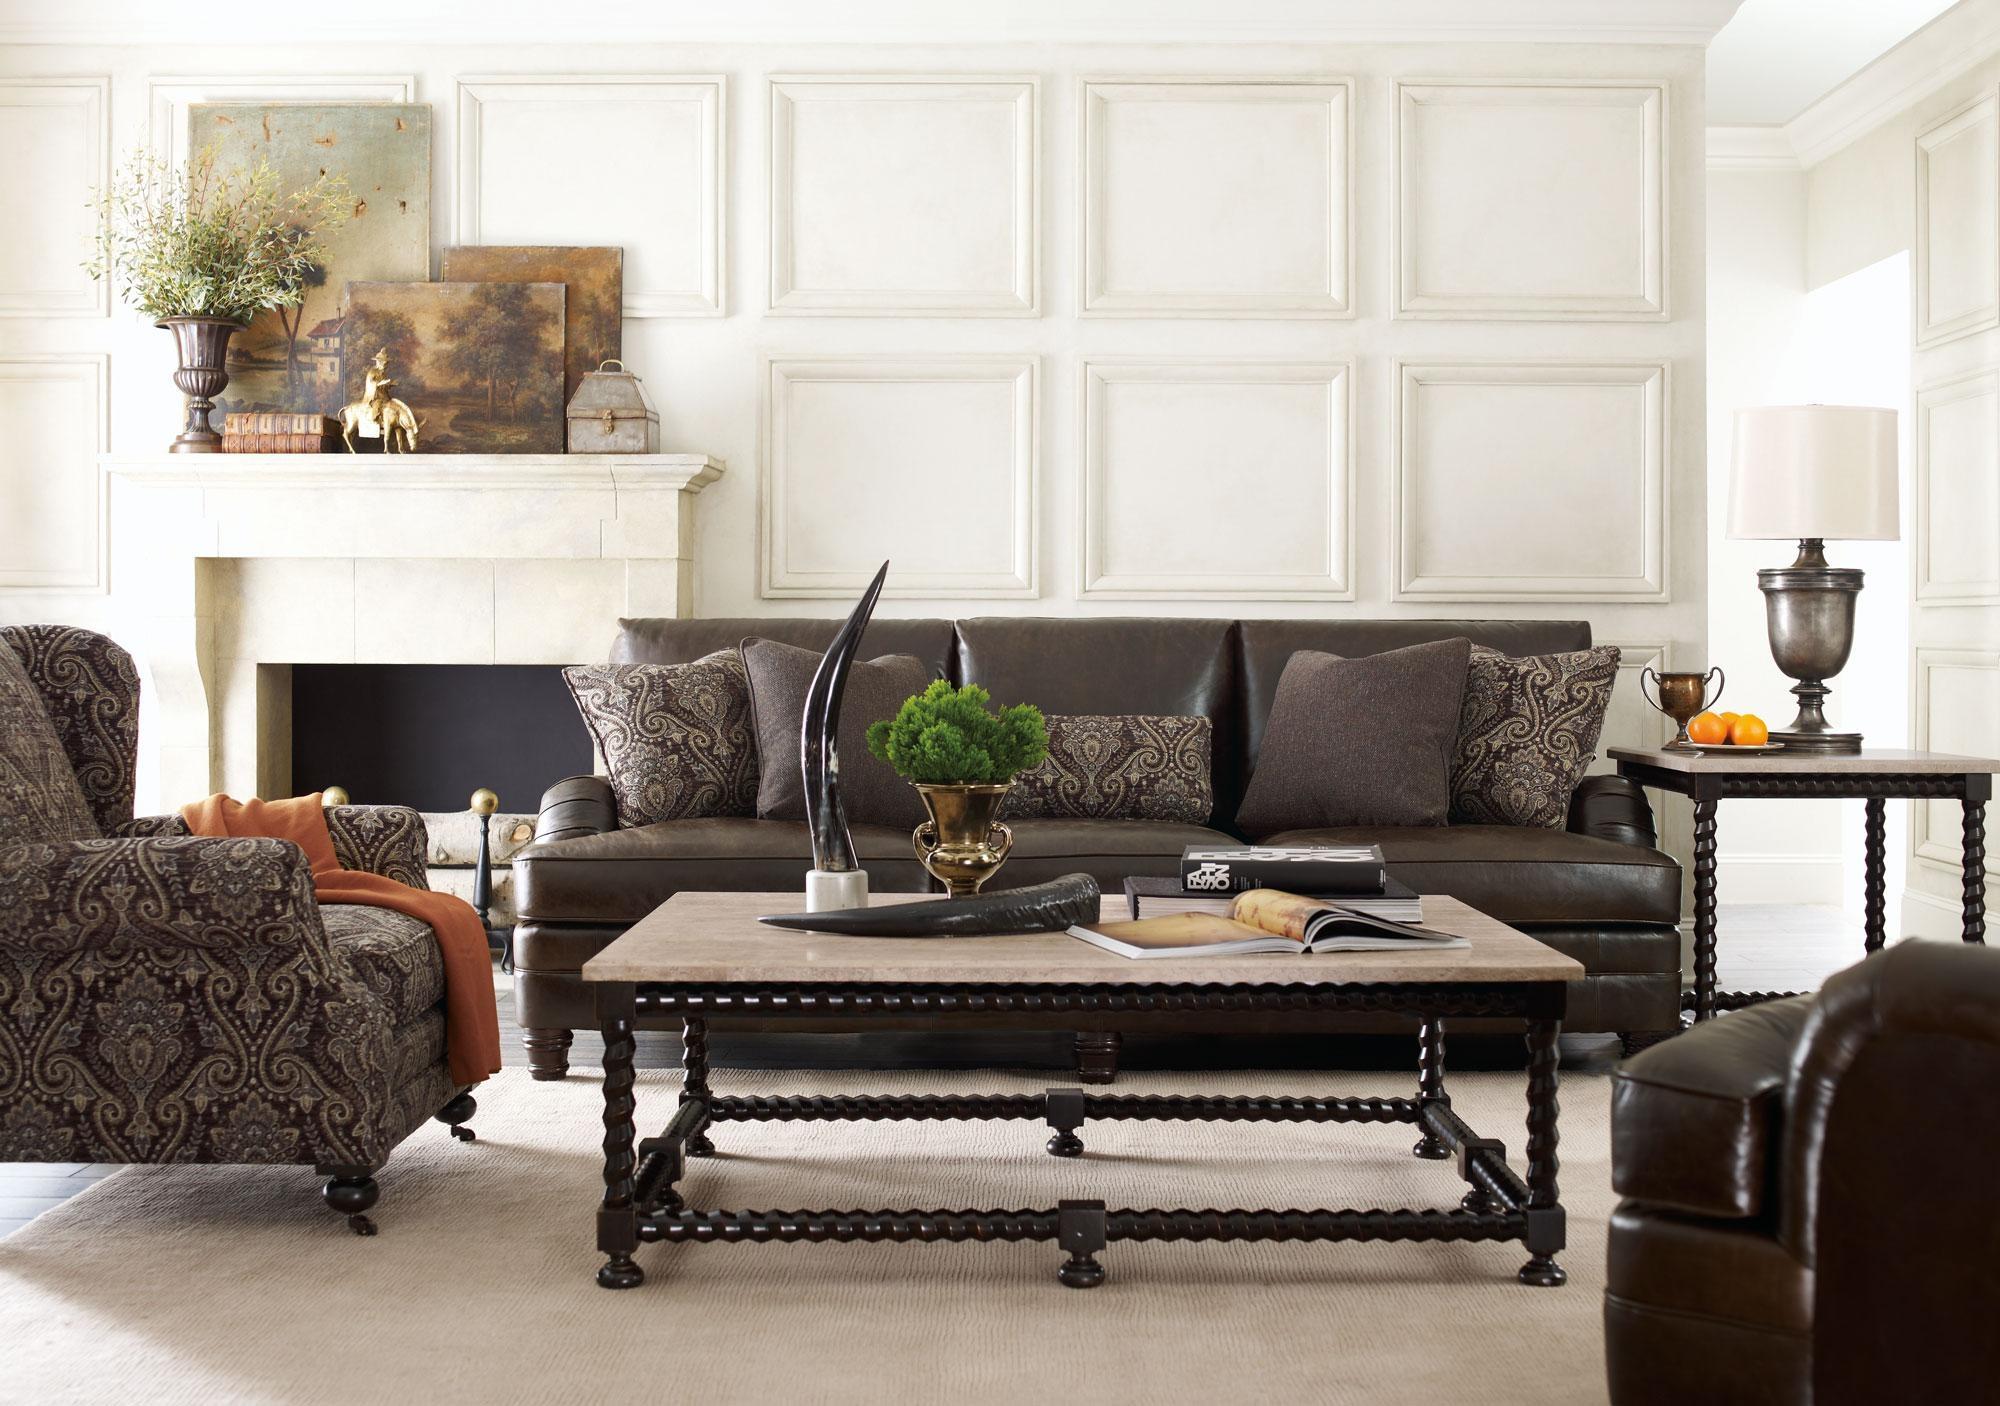 Tarleton Sofa, Justin Chair, Cordova Tables | Bernhardt Within Bernhardt Tarleton Sofas (Image 20 of 20)